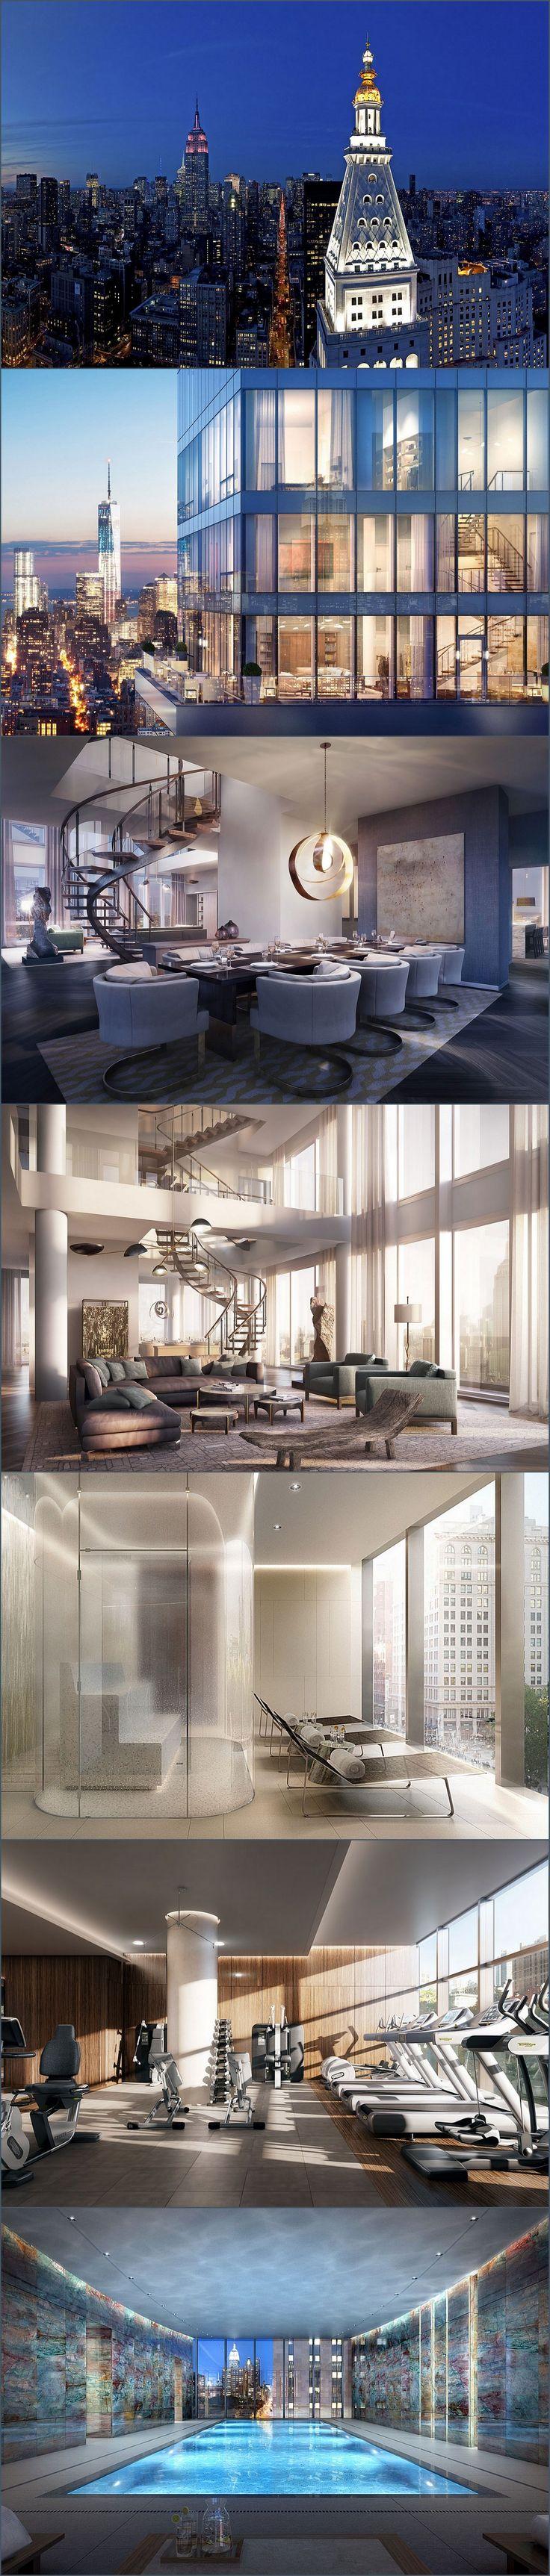 Rupert Mudroch's New - NYC Penthouse -